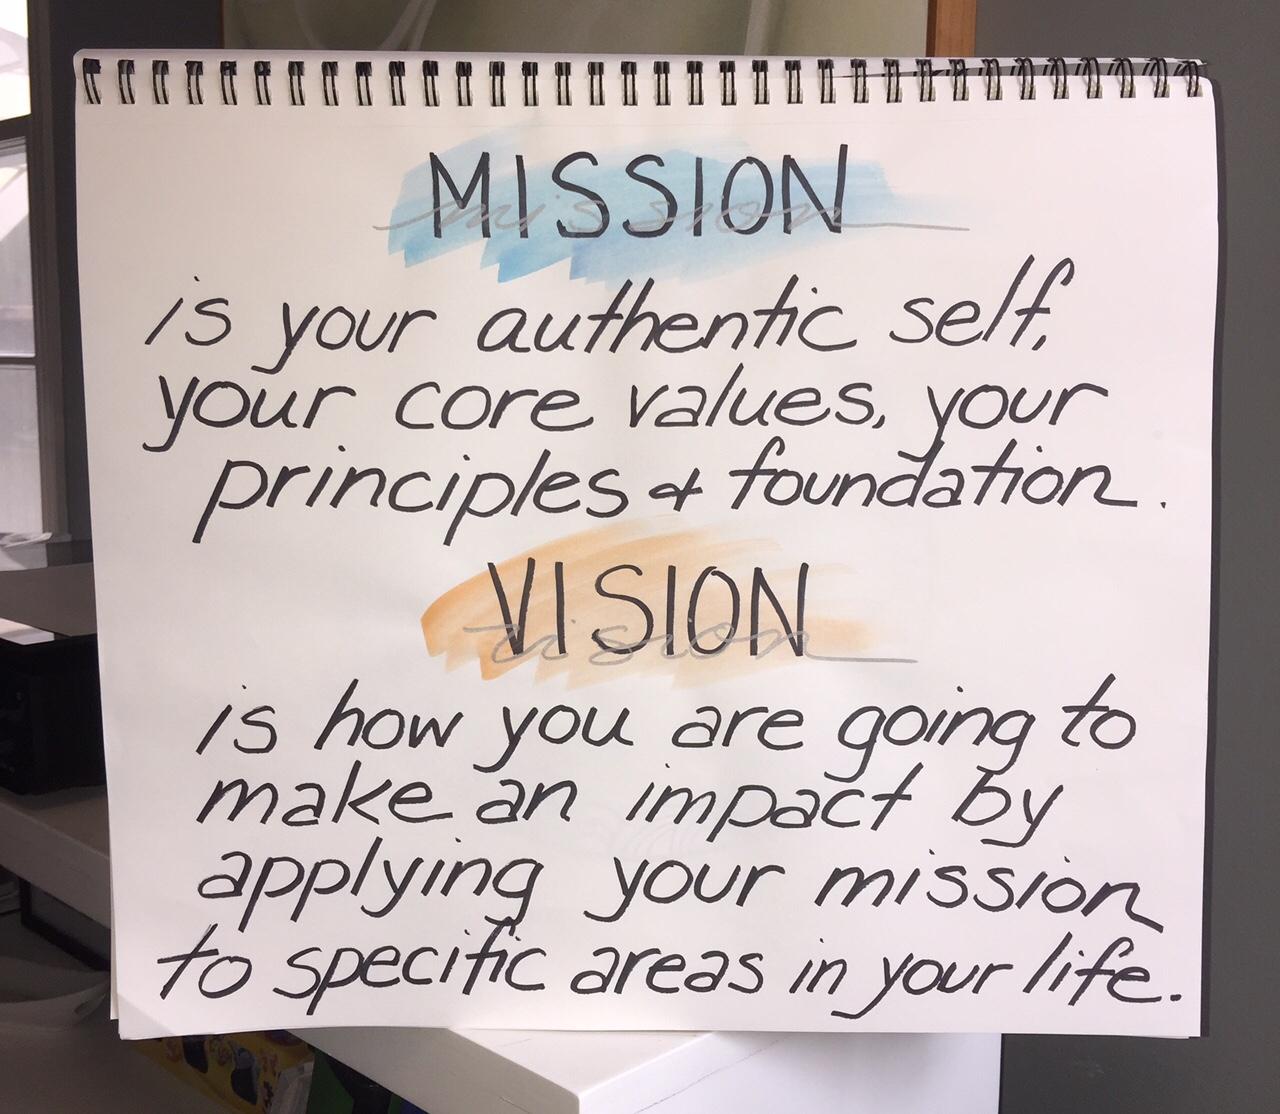 MISSIONVISION.jpg